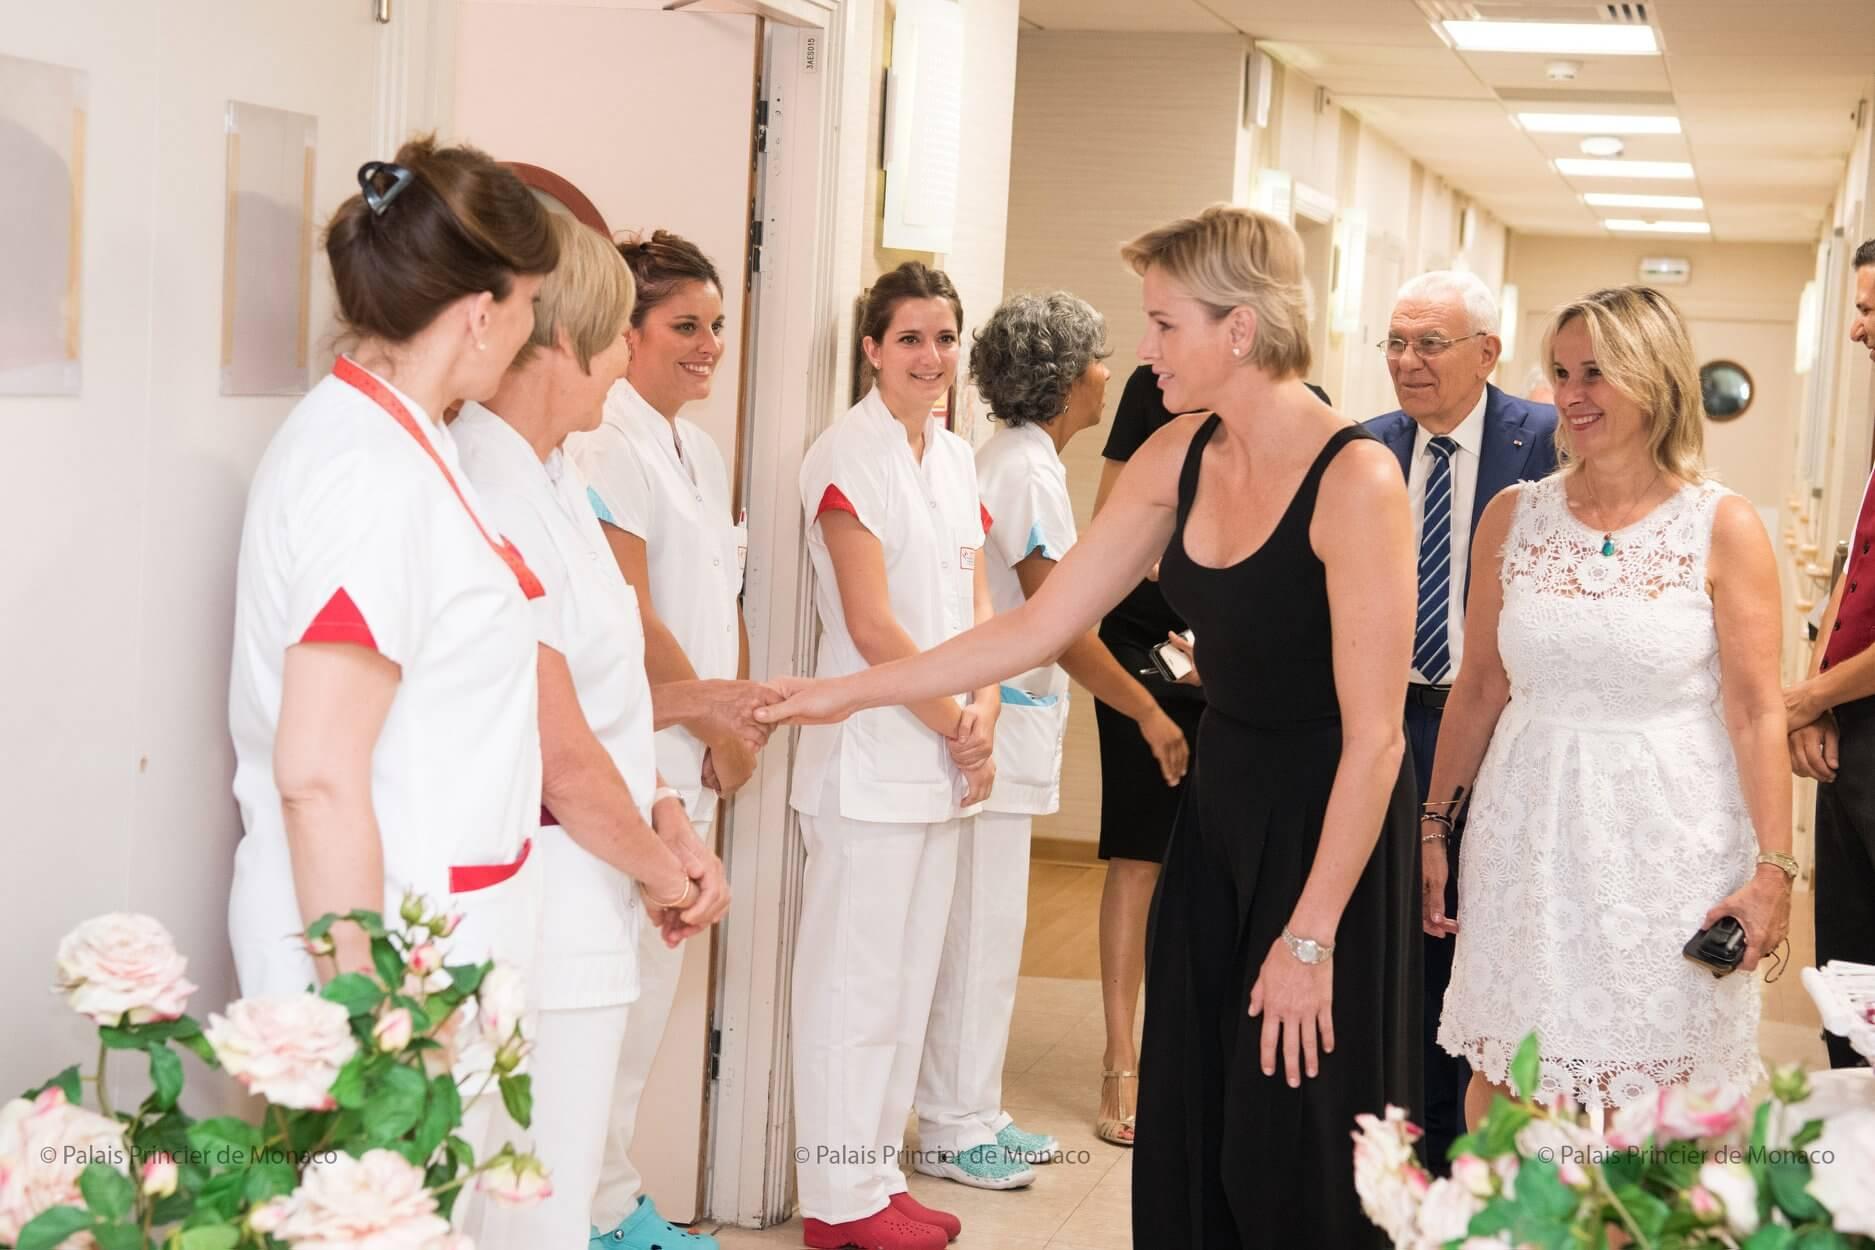 Princess Charlene visited Résidence a Qietüdine